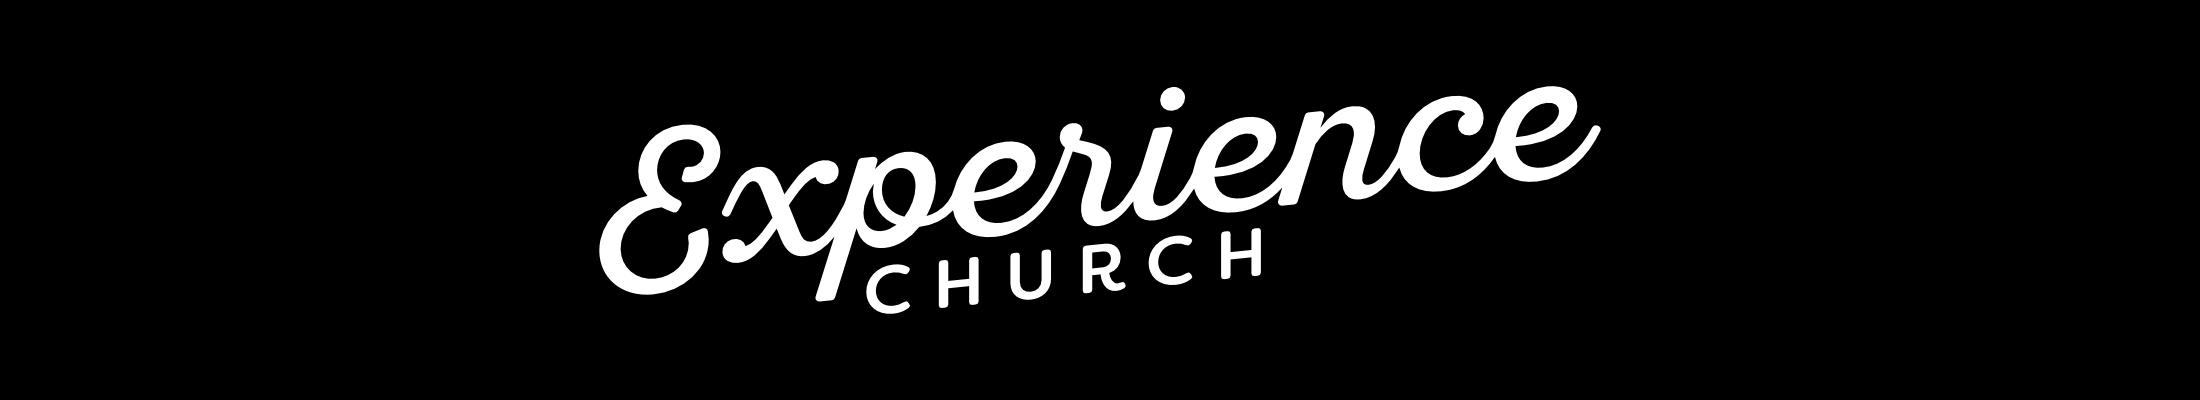 Experience_Church_San_Francisco_California.png